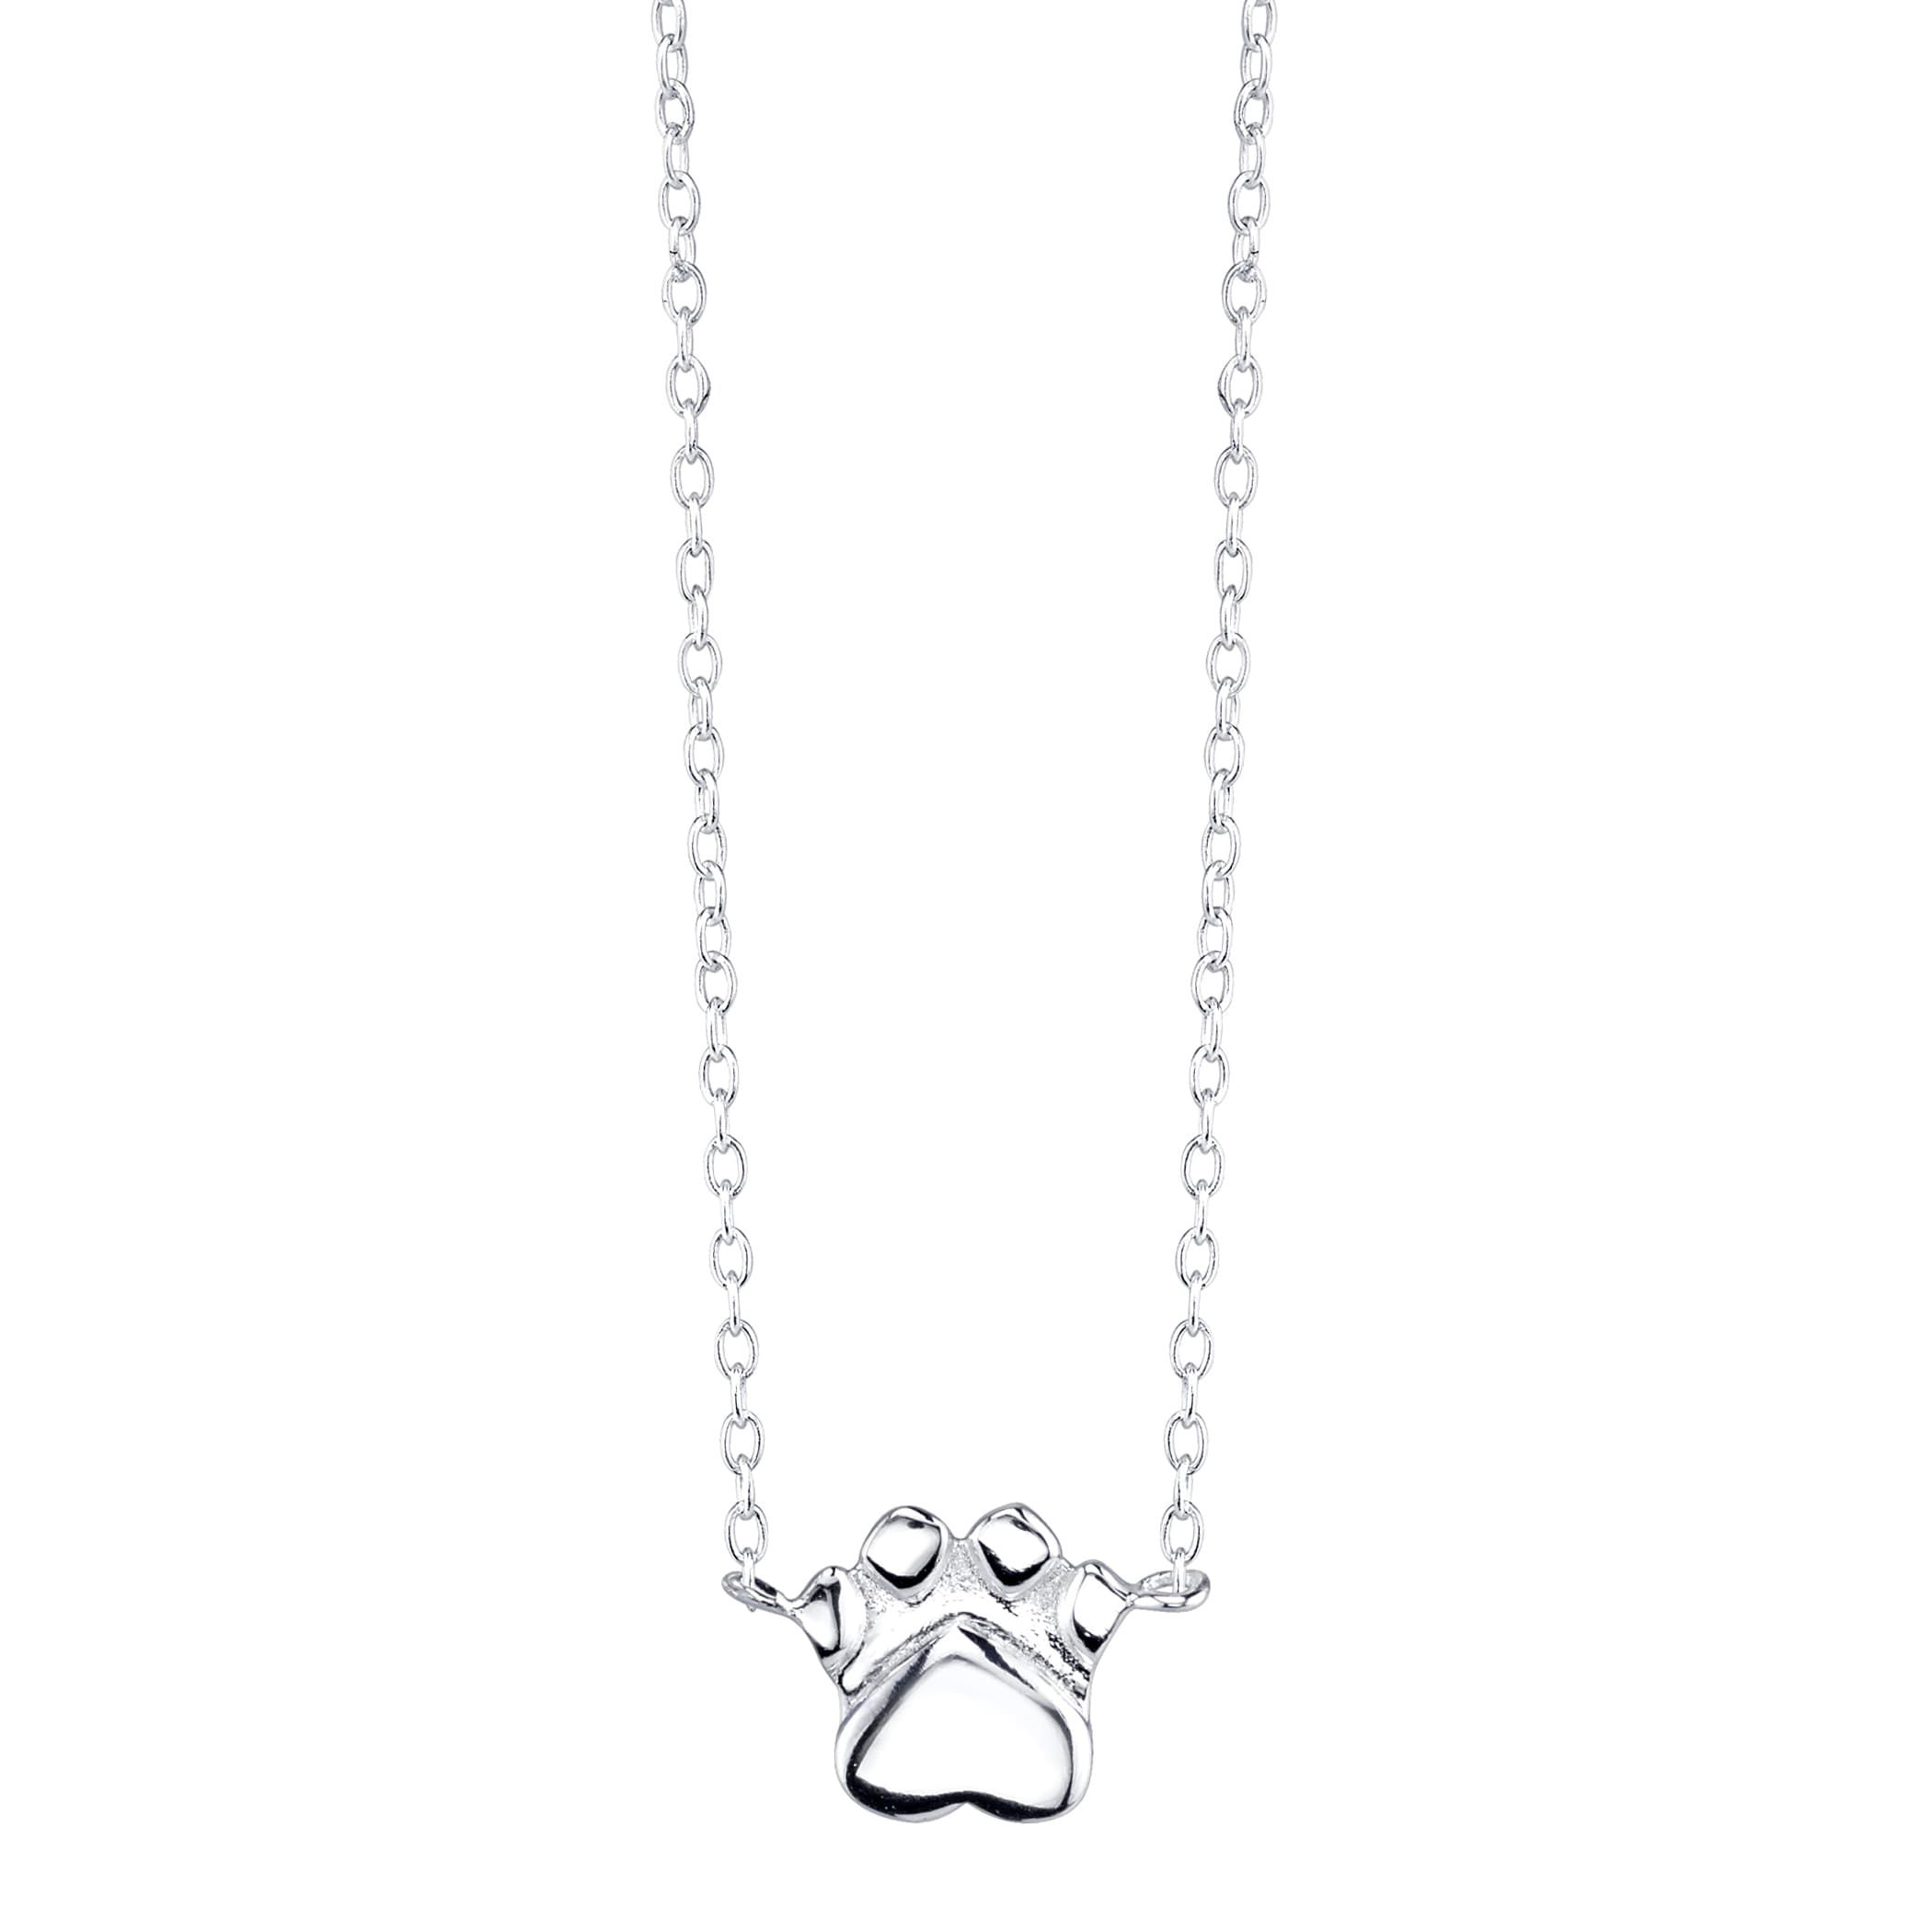 Silvertone Sterling Silver Dog Paw Mini Necklace (Sterlin...